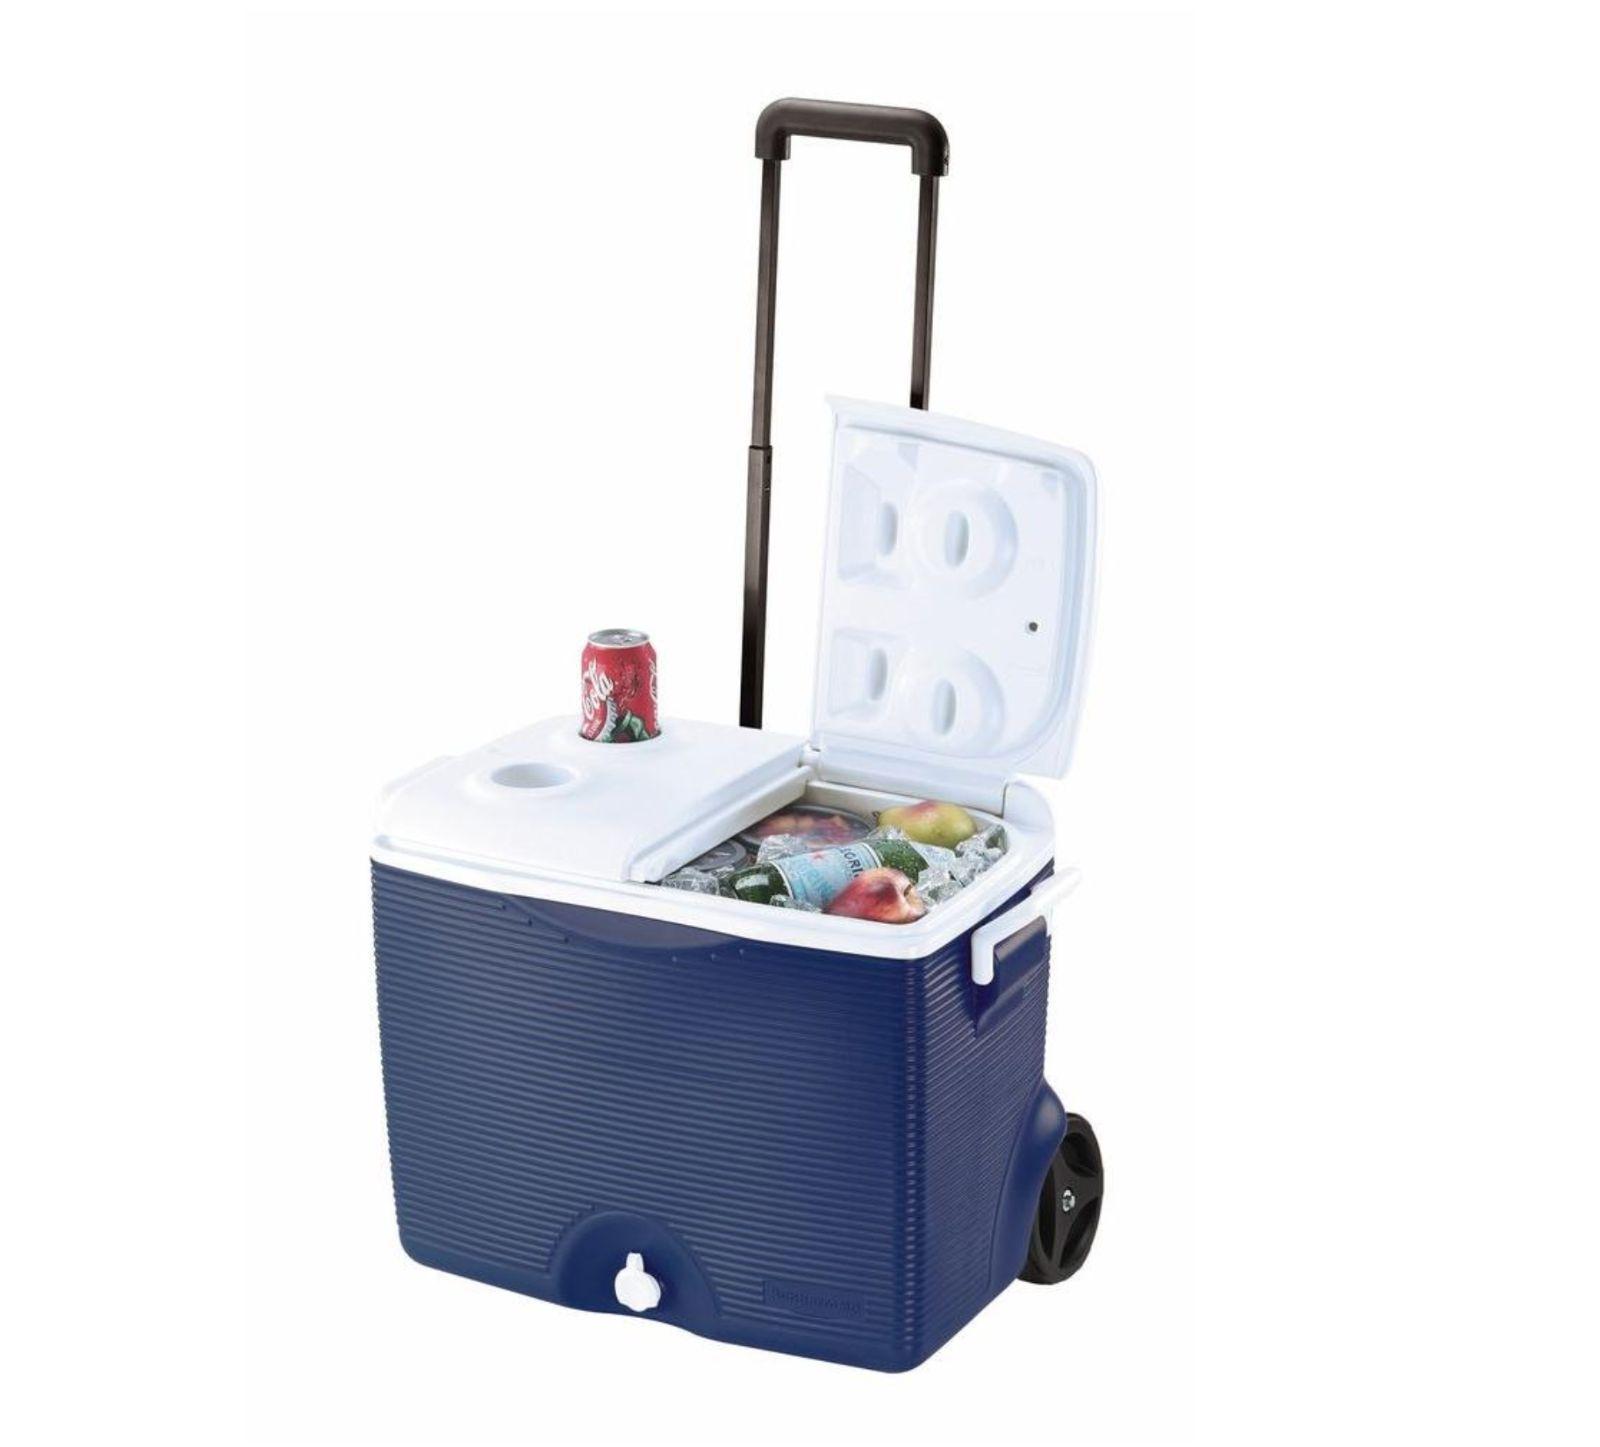 Rubbermaid Rolling Chest Cooler 45 Qt. Split Lid w  Pull Handle Cup Holders Blau